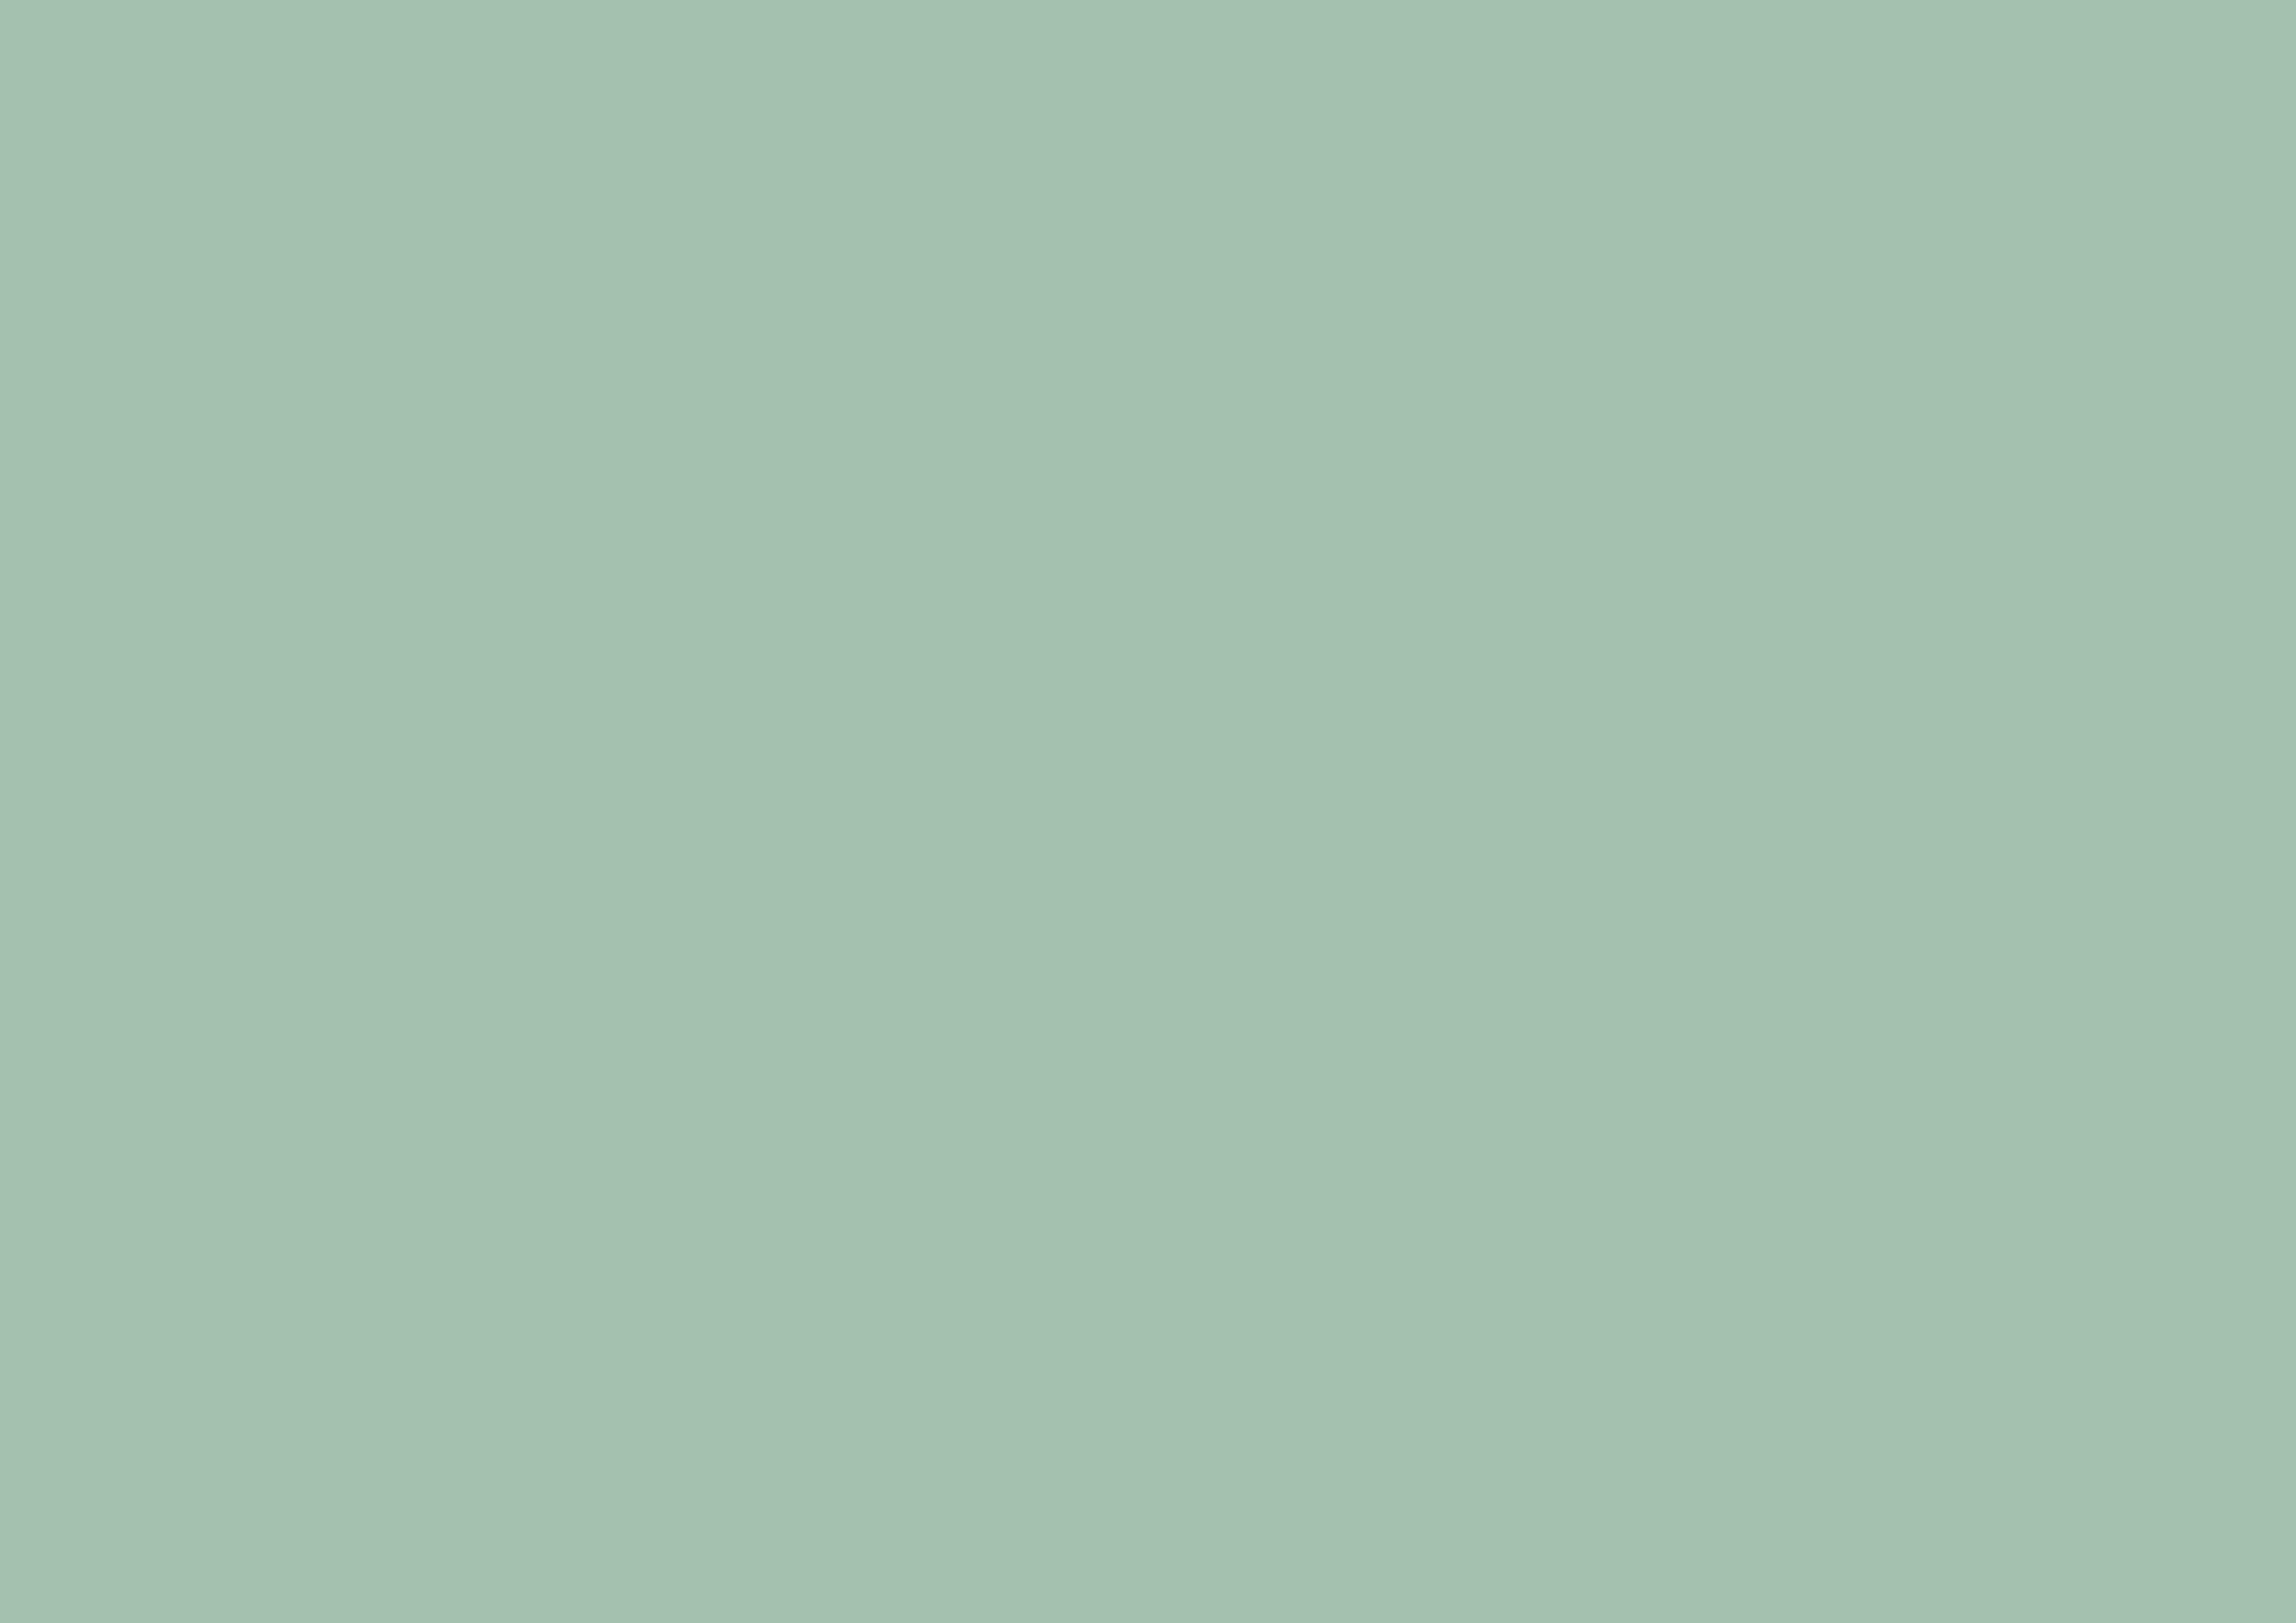 3508x2480 Cambridge Blue Solid Color Background